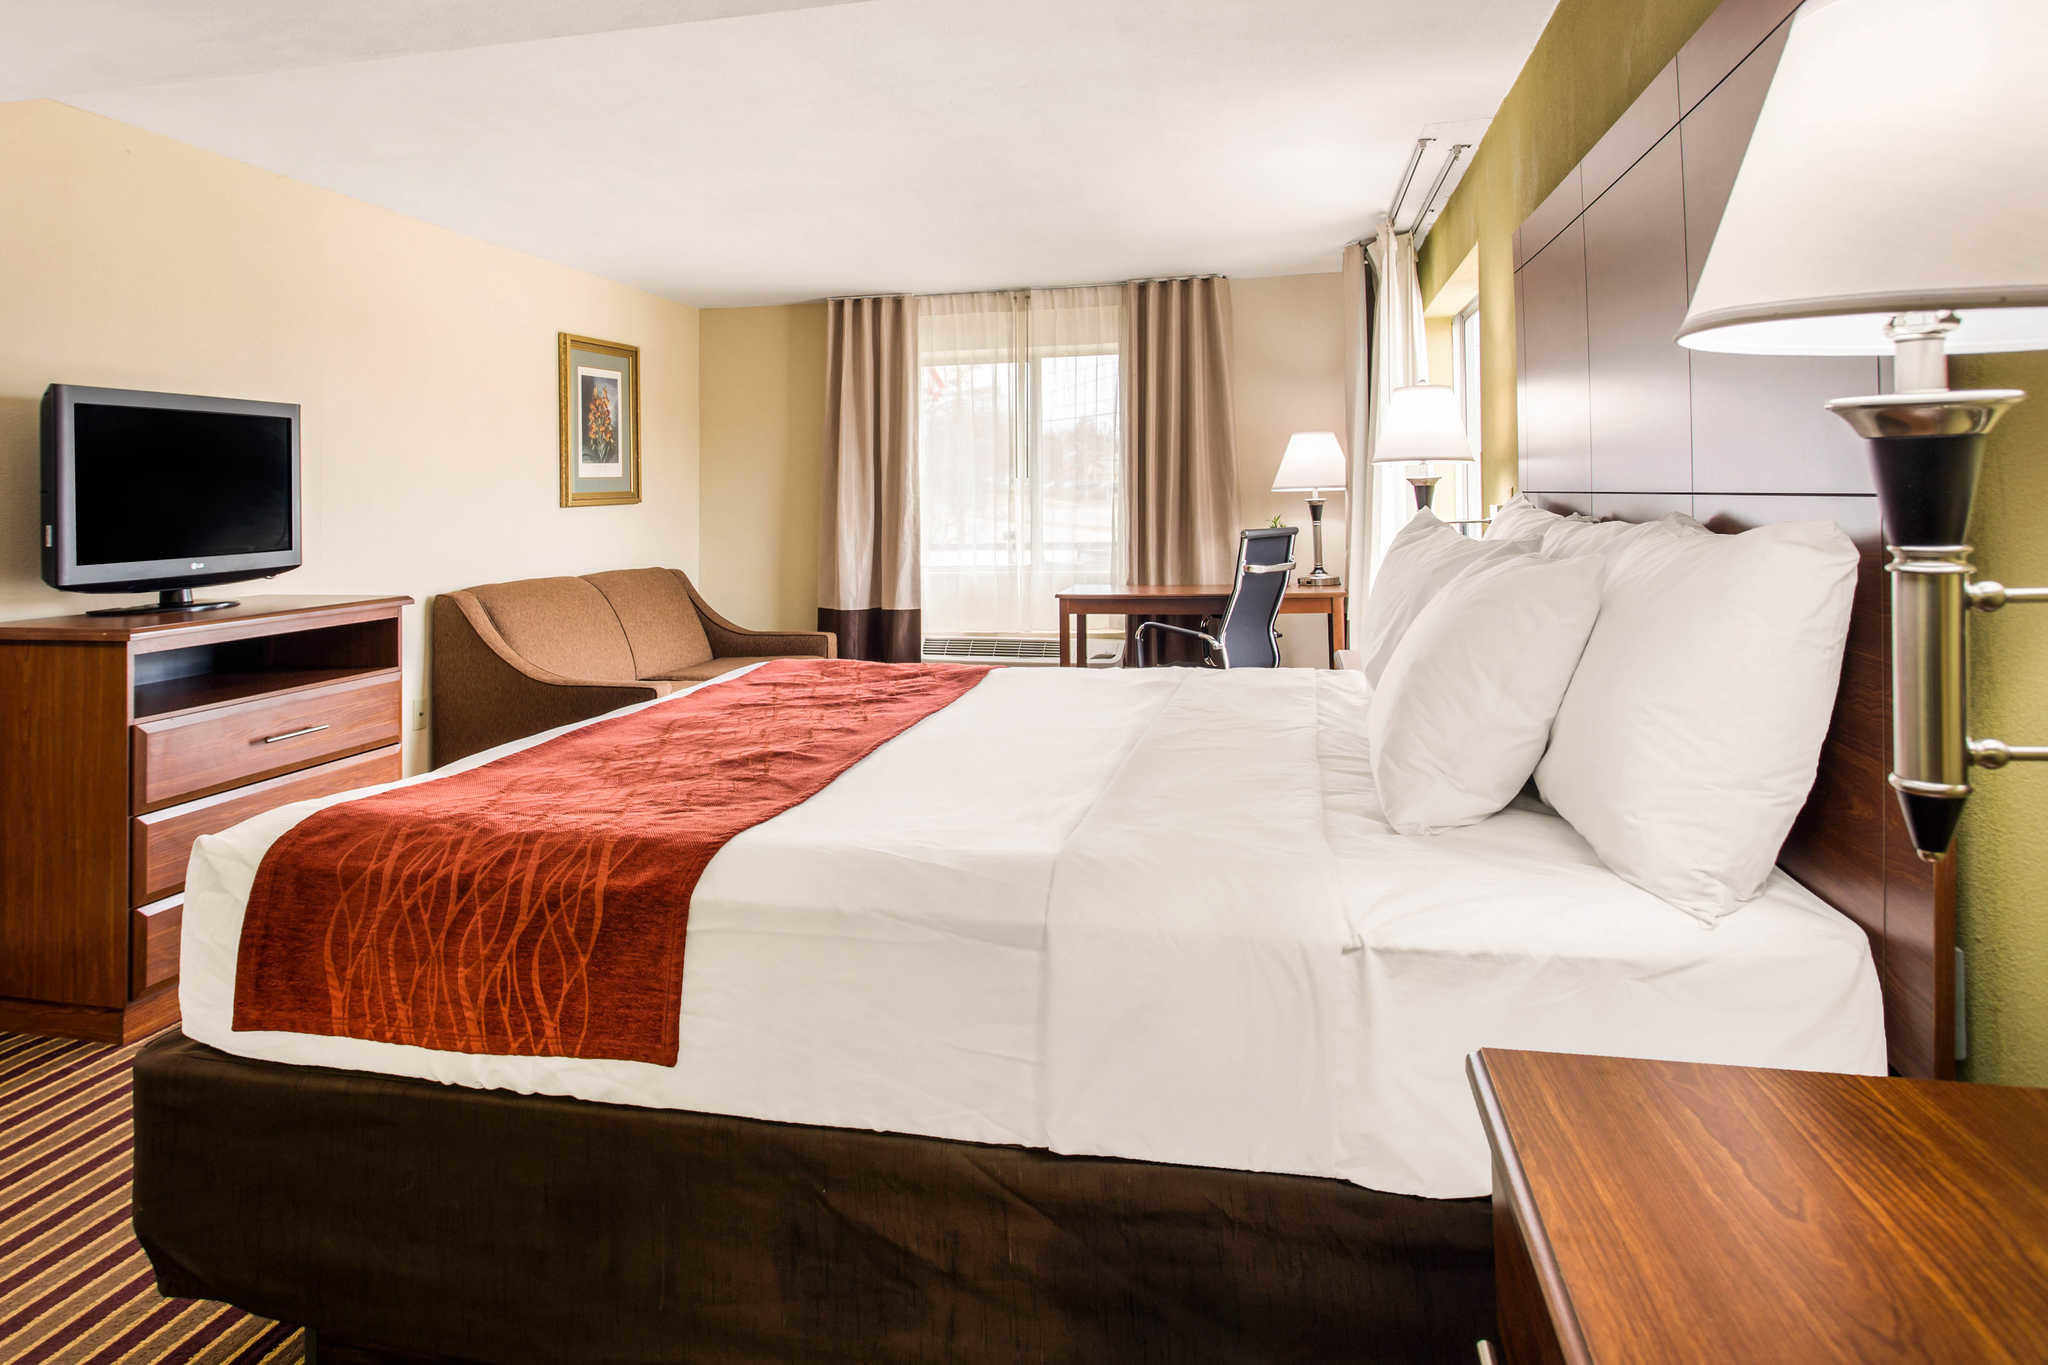 Comfort Inn & Suites Crabtree Valley image 28